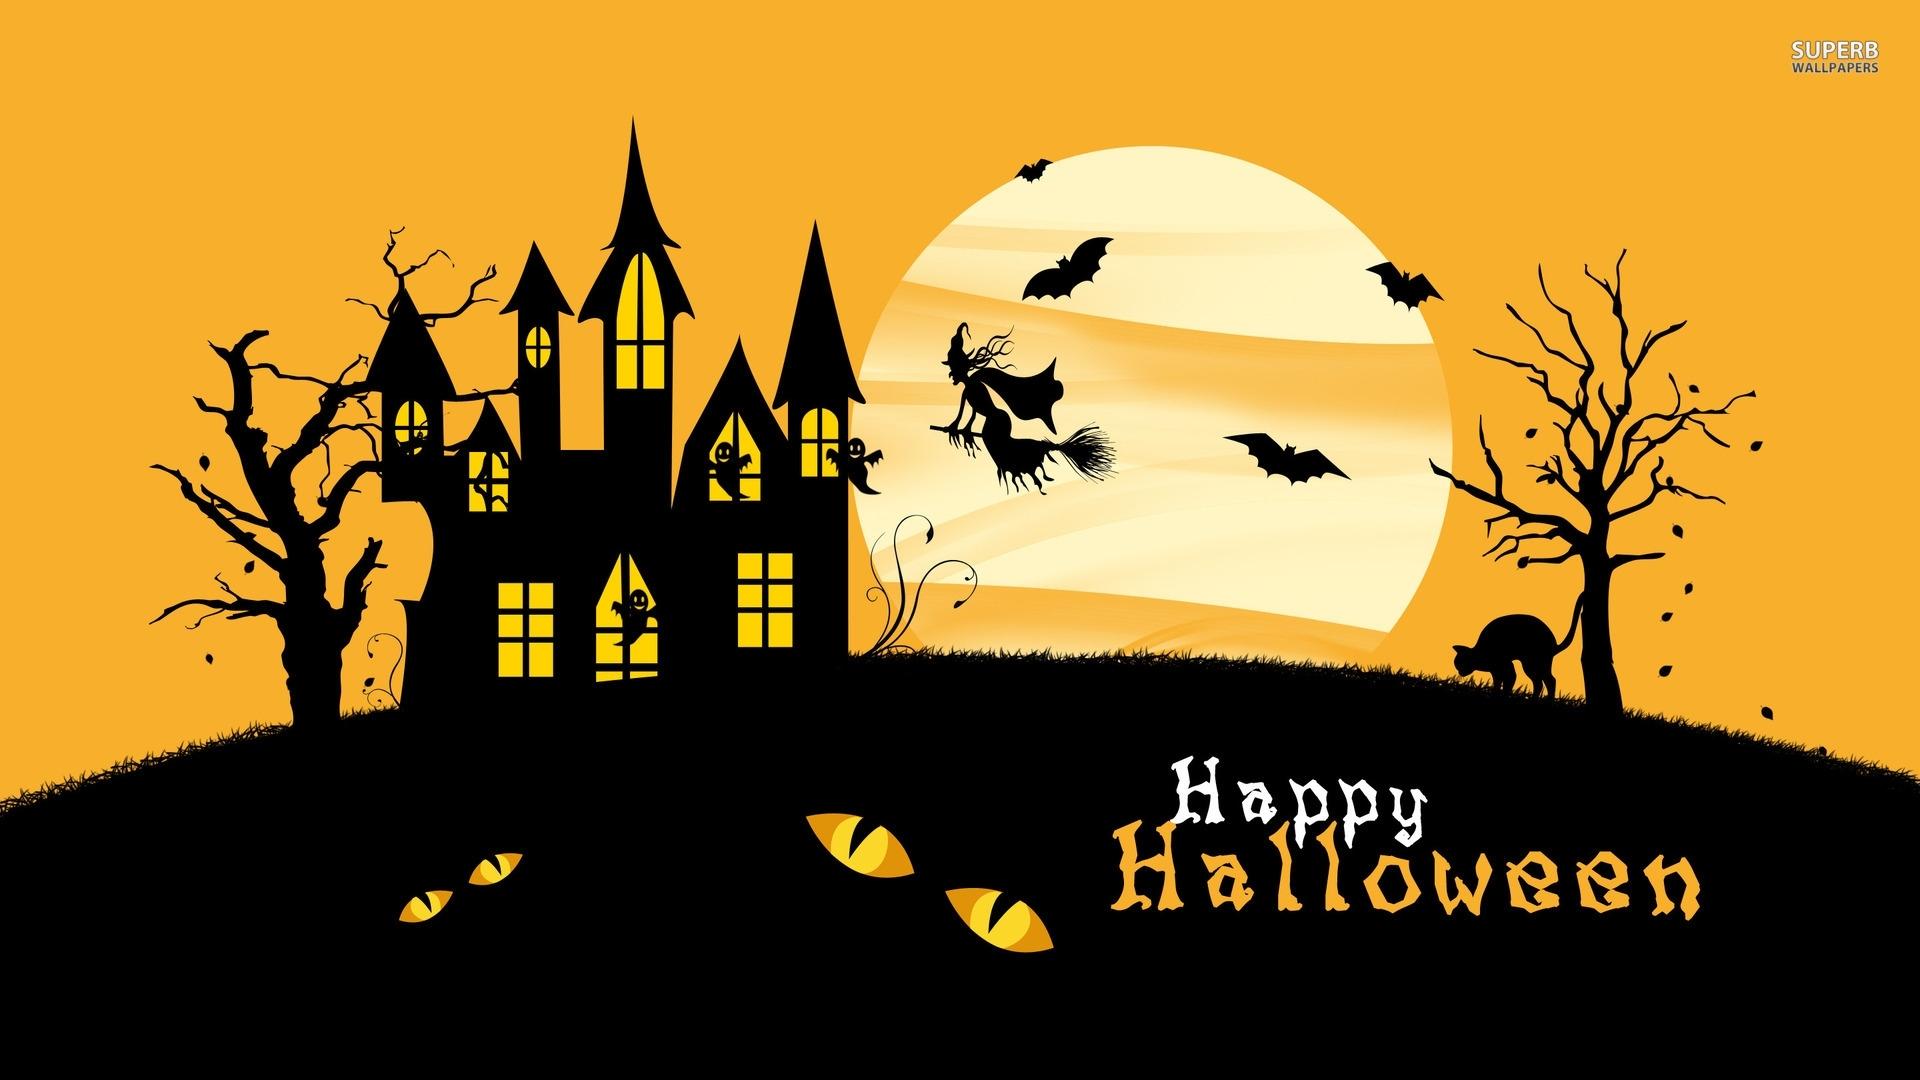 desktop wallpaper happy halloween #h441606 | holidays hd images